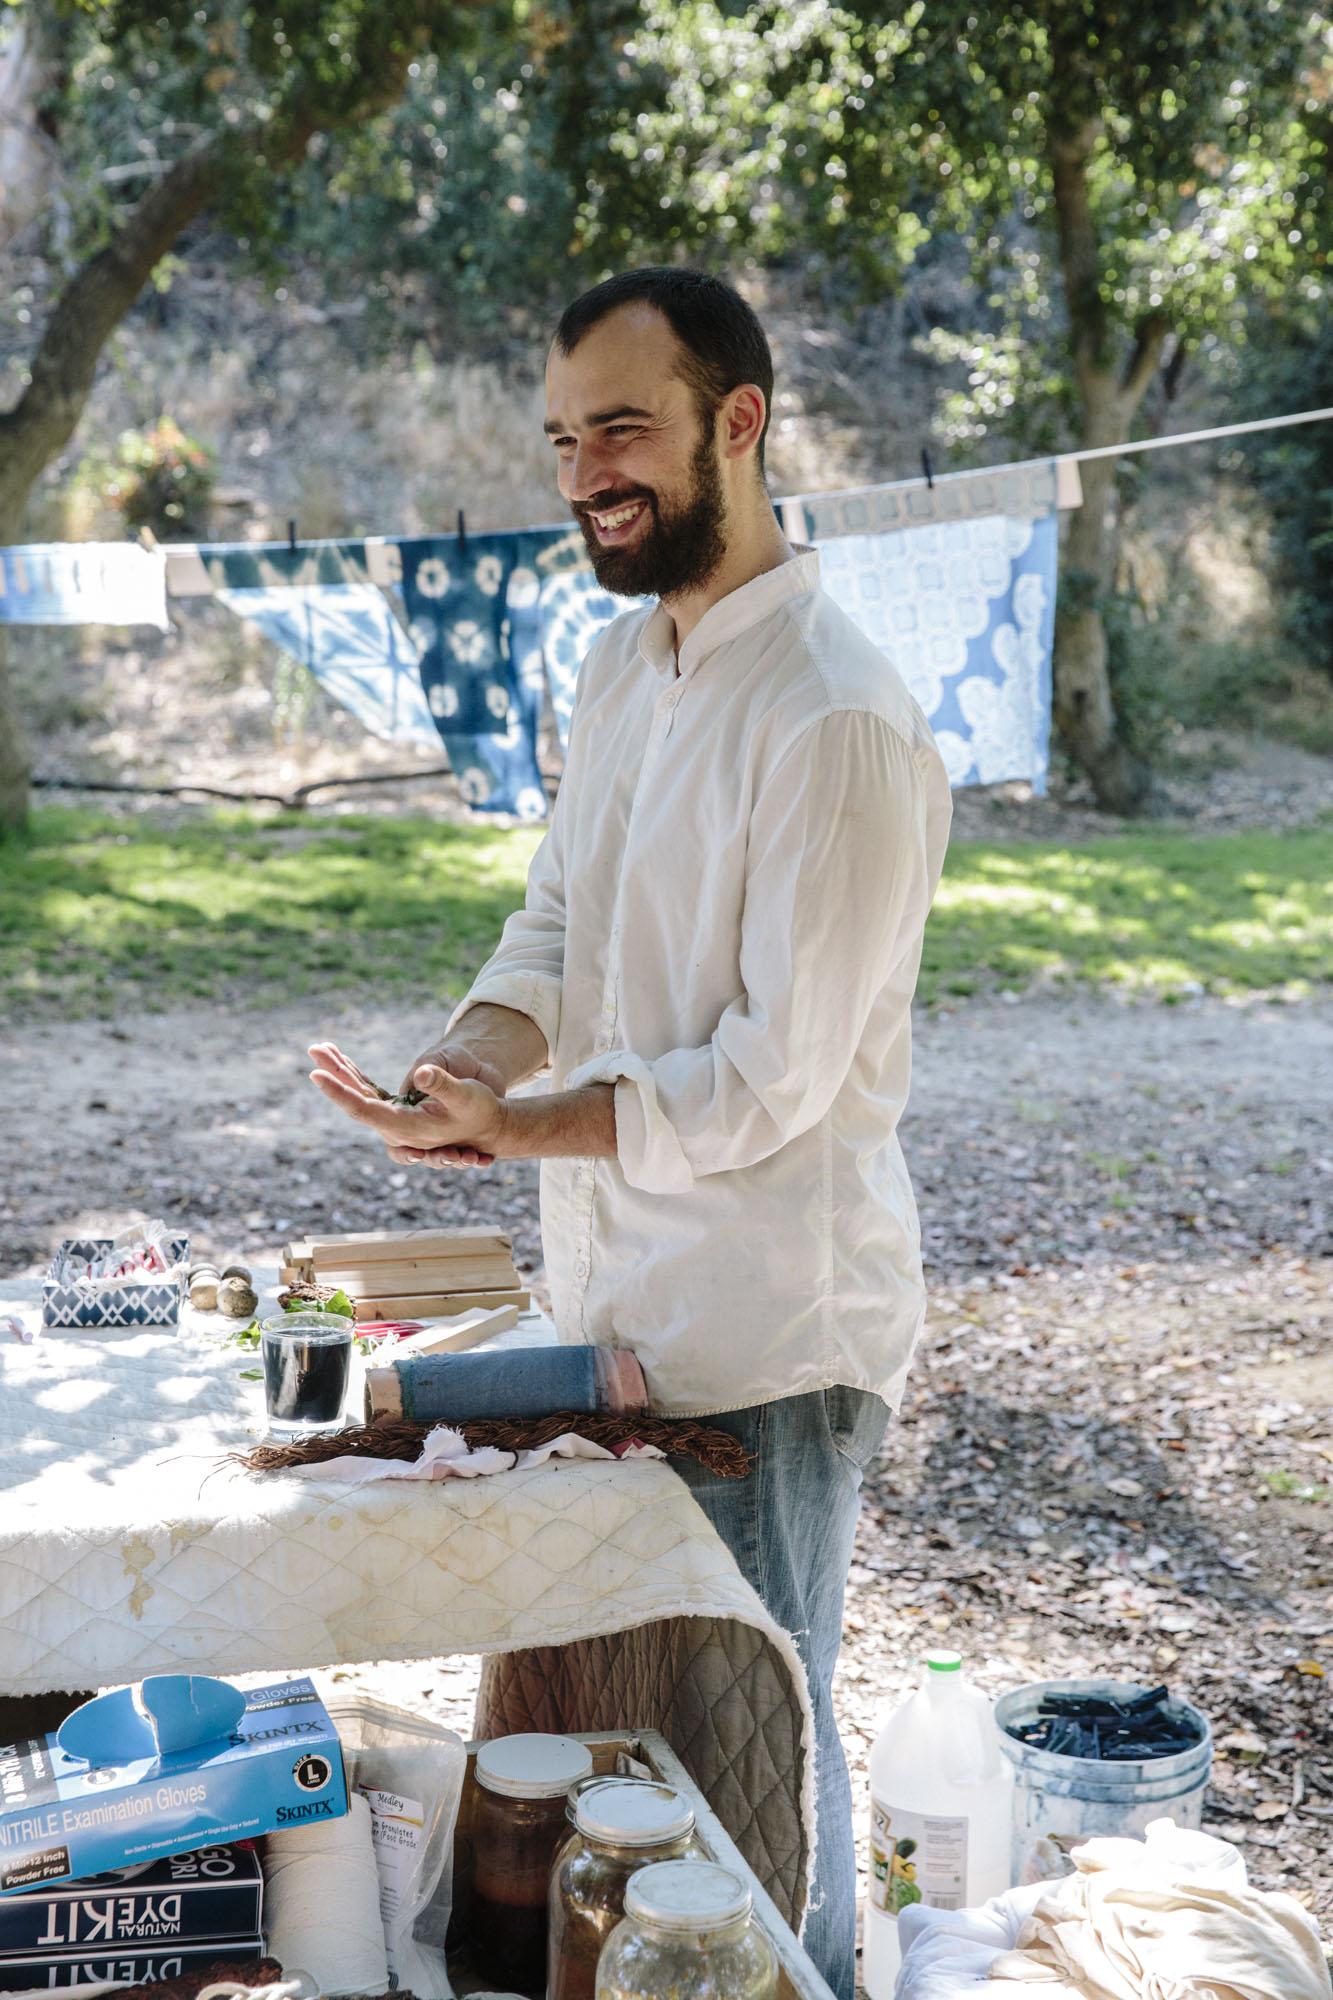 Graham Keegan teaching indigo dye extraction